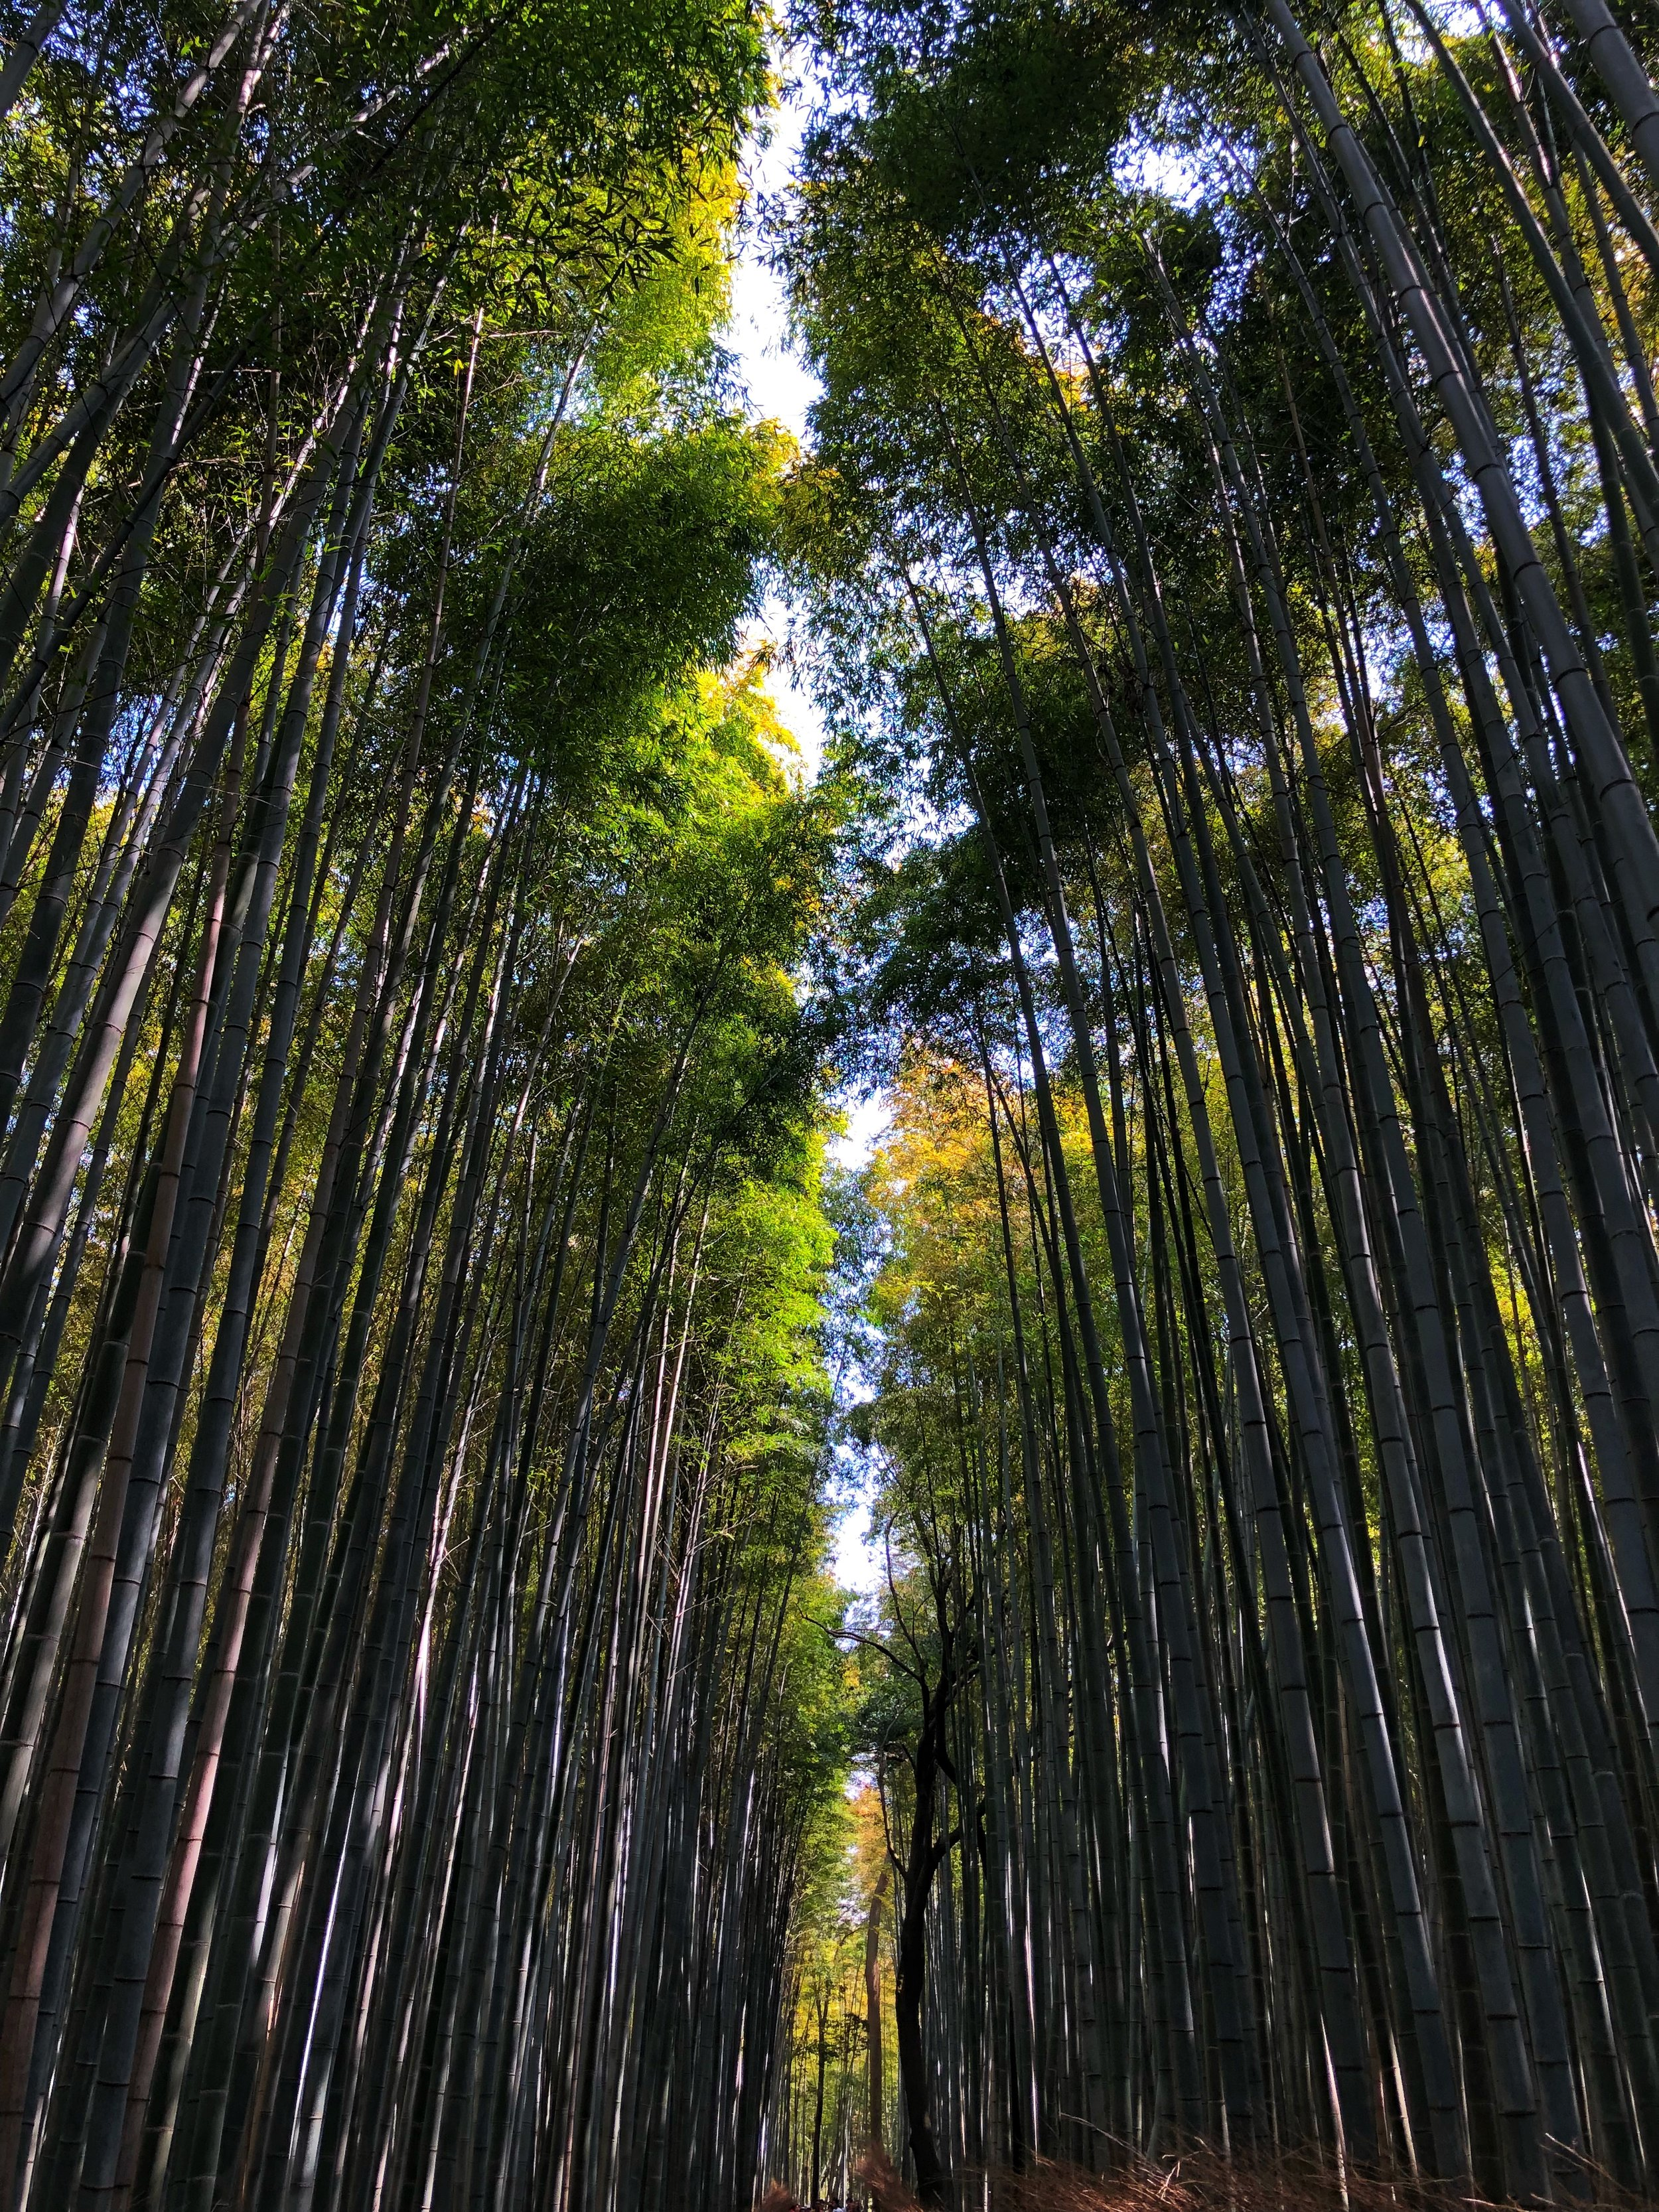 Arashiyama Bamboo Grove: Don't Forget To Look Up!